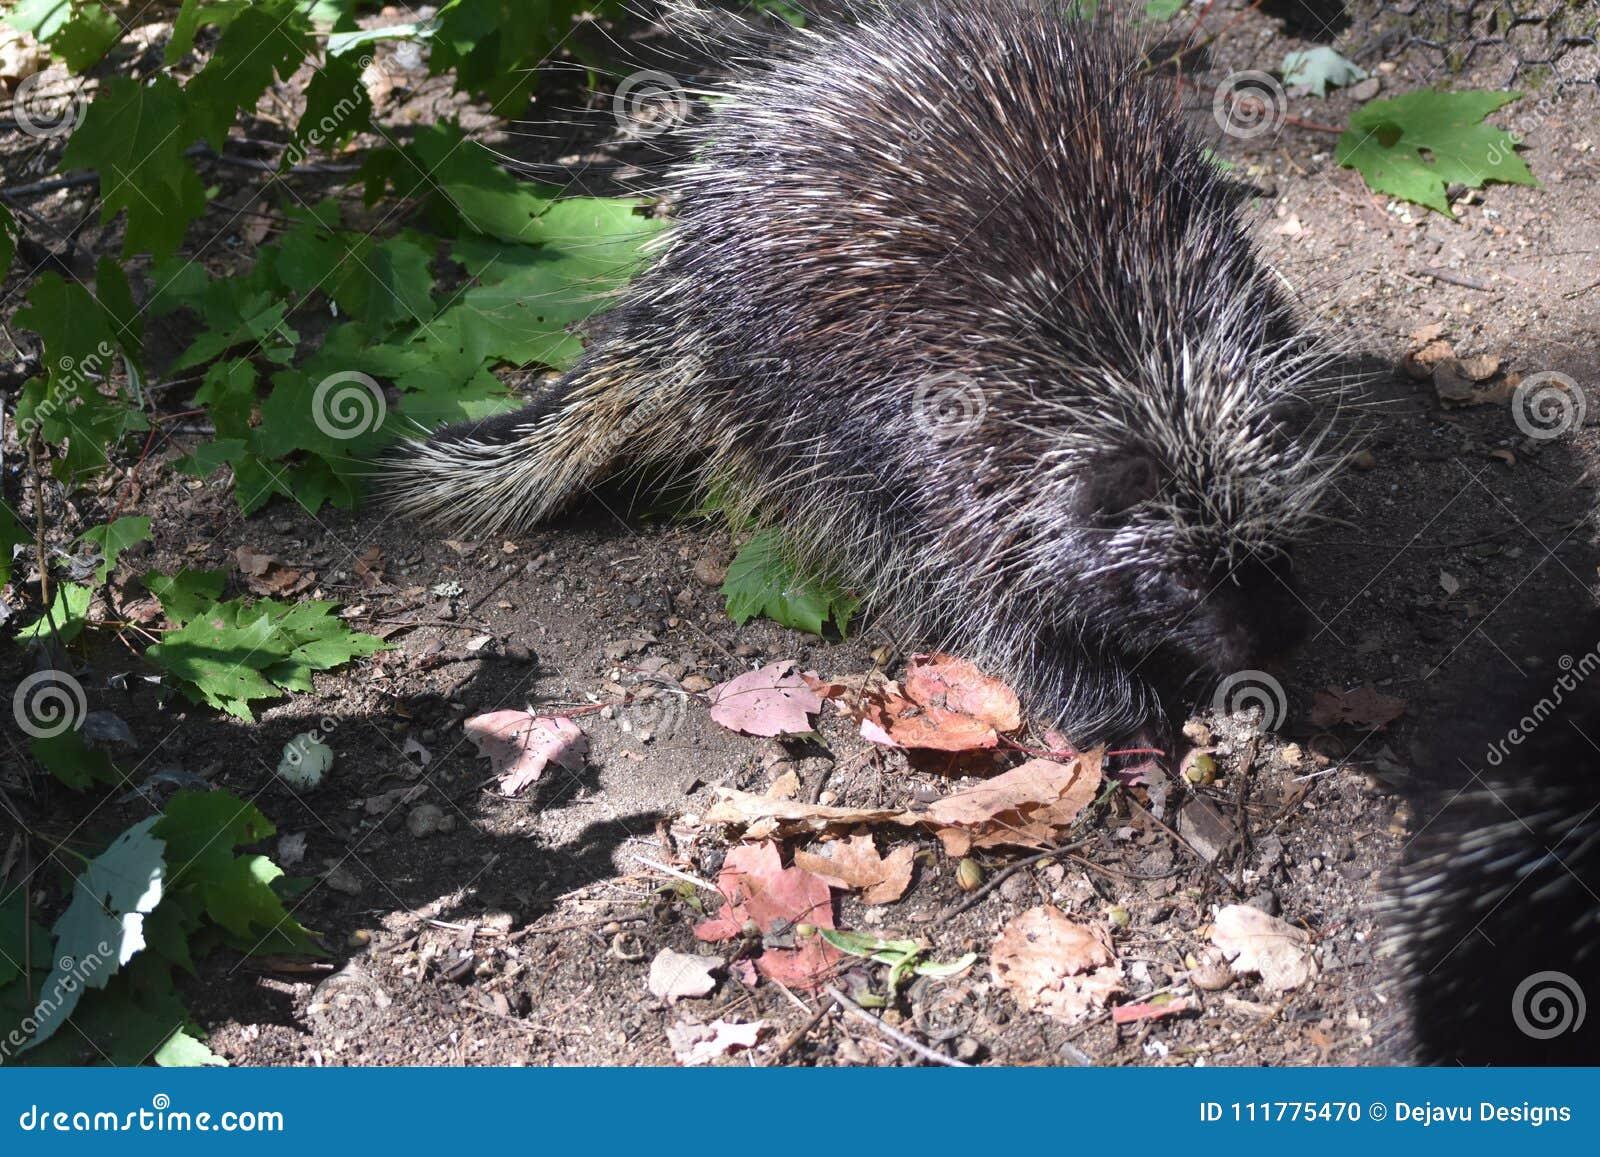 Cute black porcupine walking through some leaves